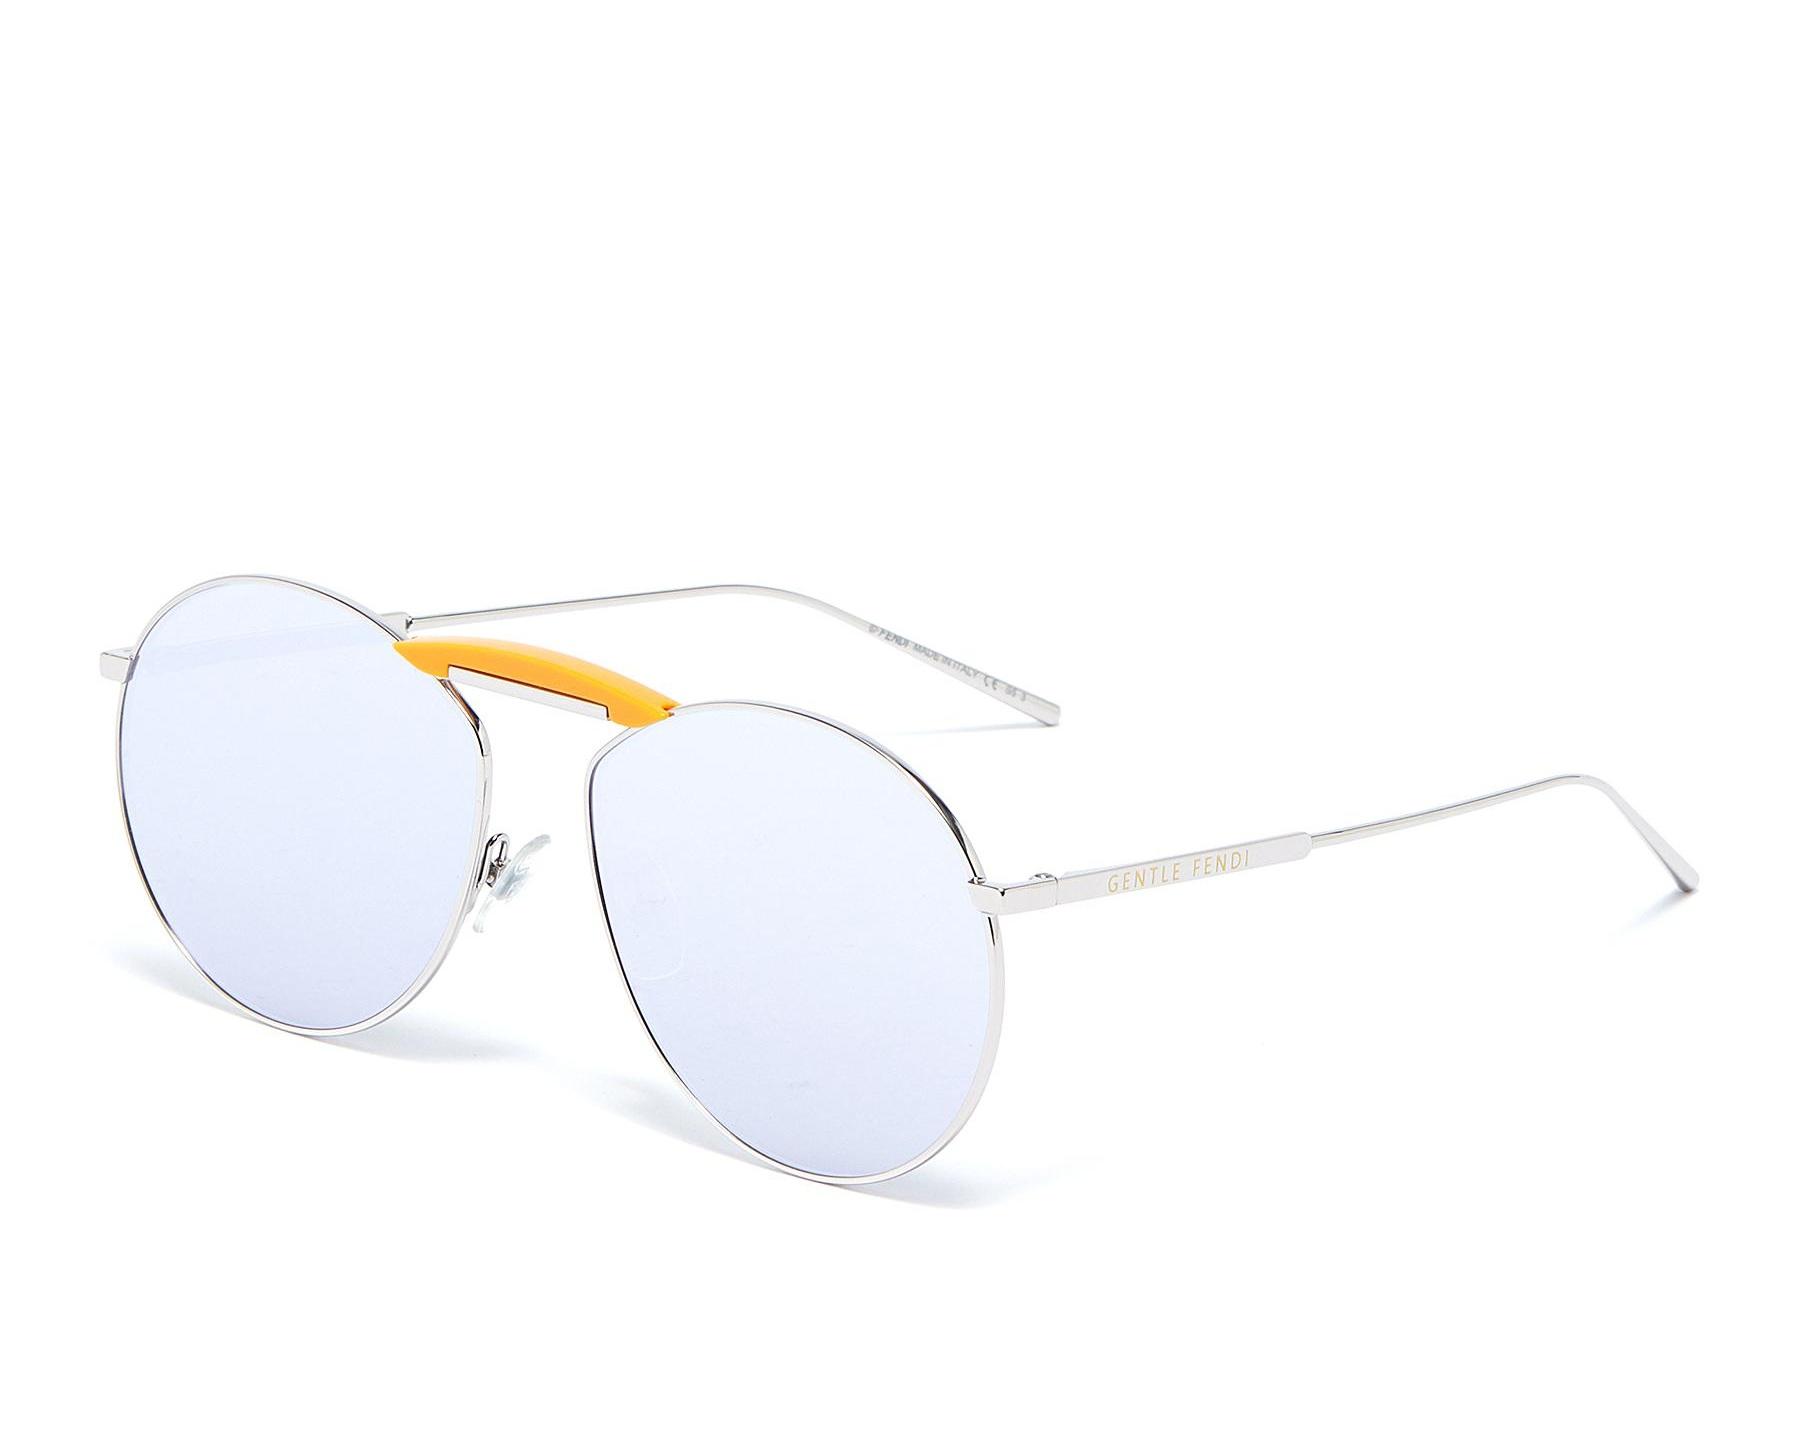 △  Fendi X Gentle Monster 'Gentle Fendi 02' Acetate Bridge Metal Round Sunglasses  HK$2910